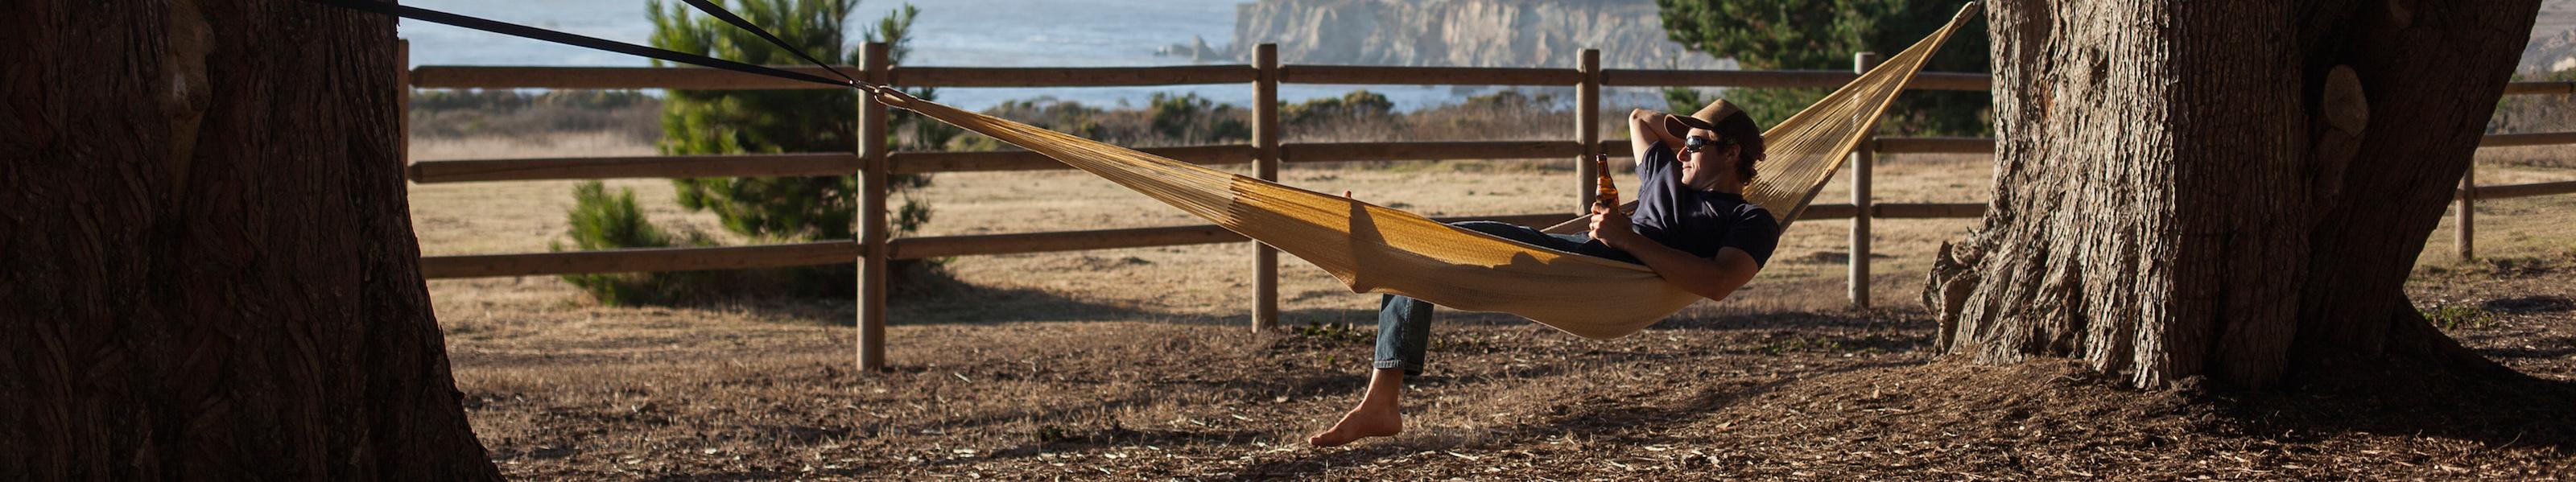 Big sur hammock   5   lifestyle.jpg?ixlib=rails 2.1